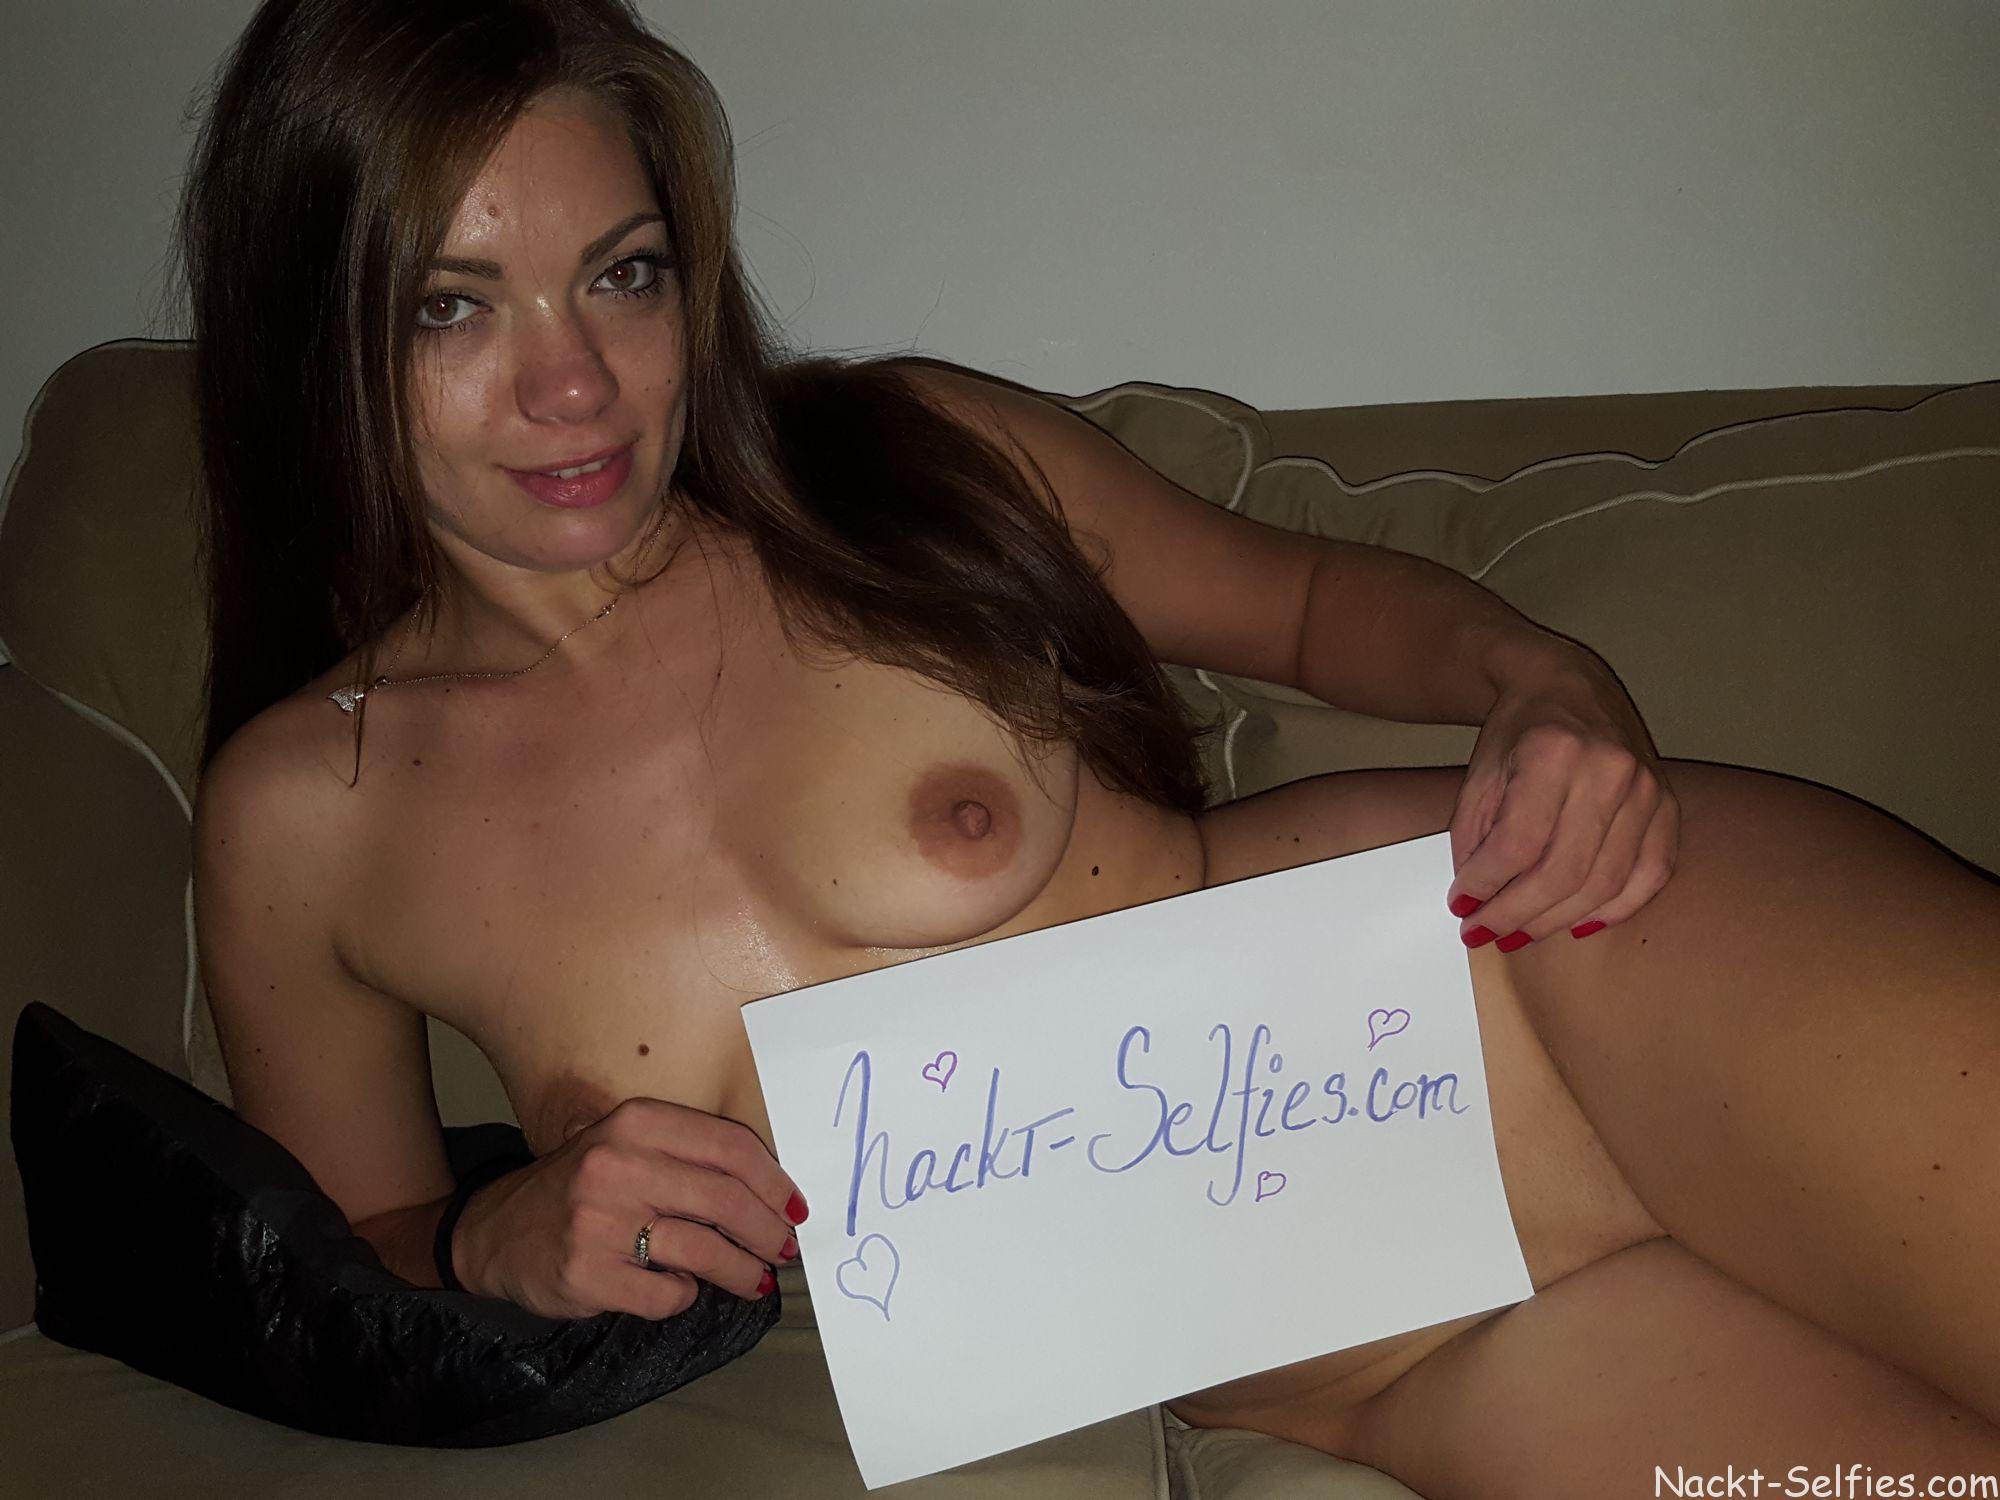 Nackte Frau Kristin Hot or Not